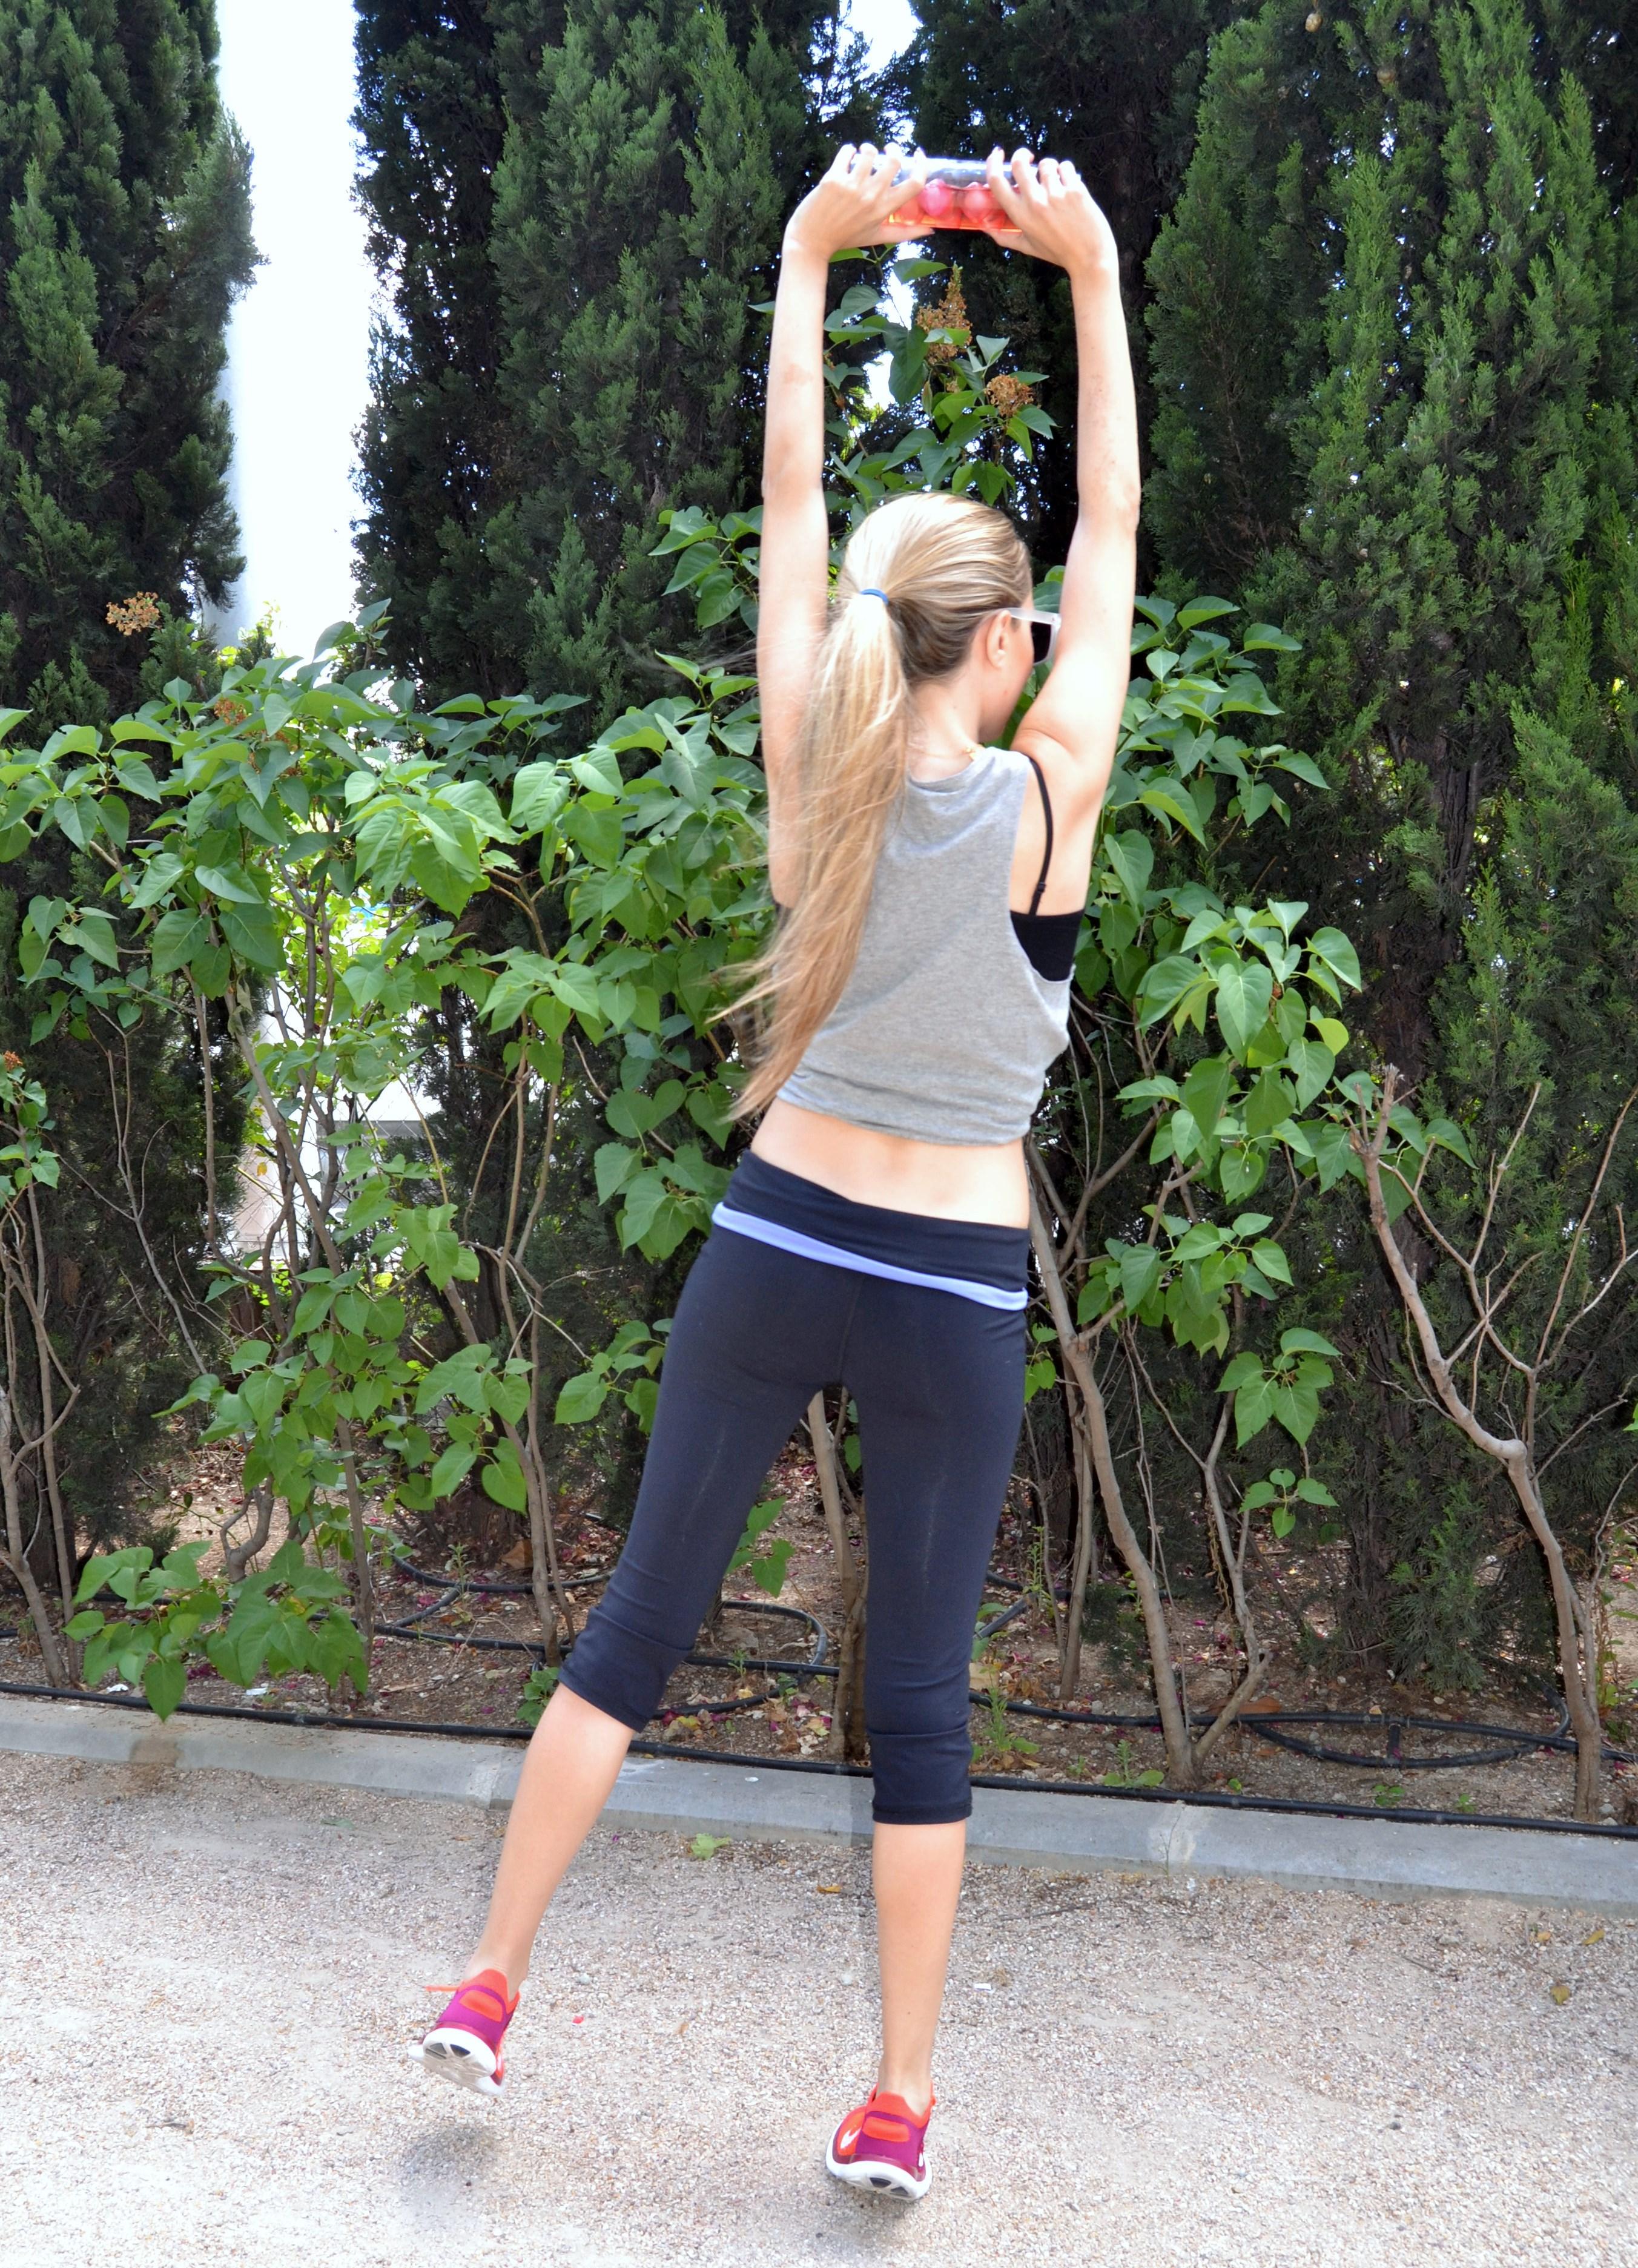 HerbaPremium_Healthy_Life_Sporty_Outfit_Fitness_Nike_Free_Flyknit_Mirror_Sunnies_Lara_Martin_Gilarranz_Bymyheels (25)